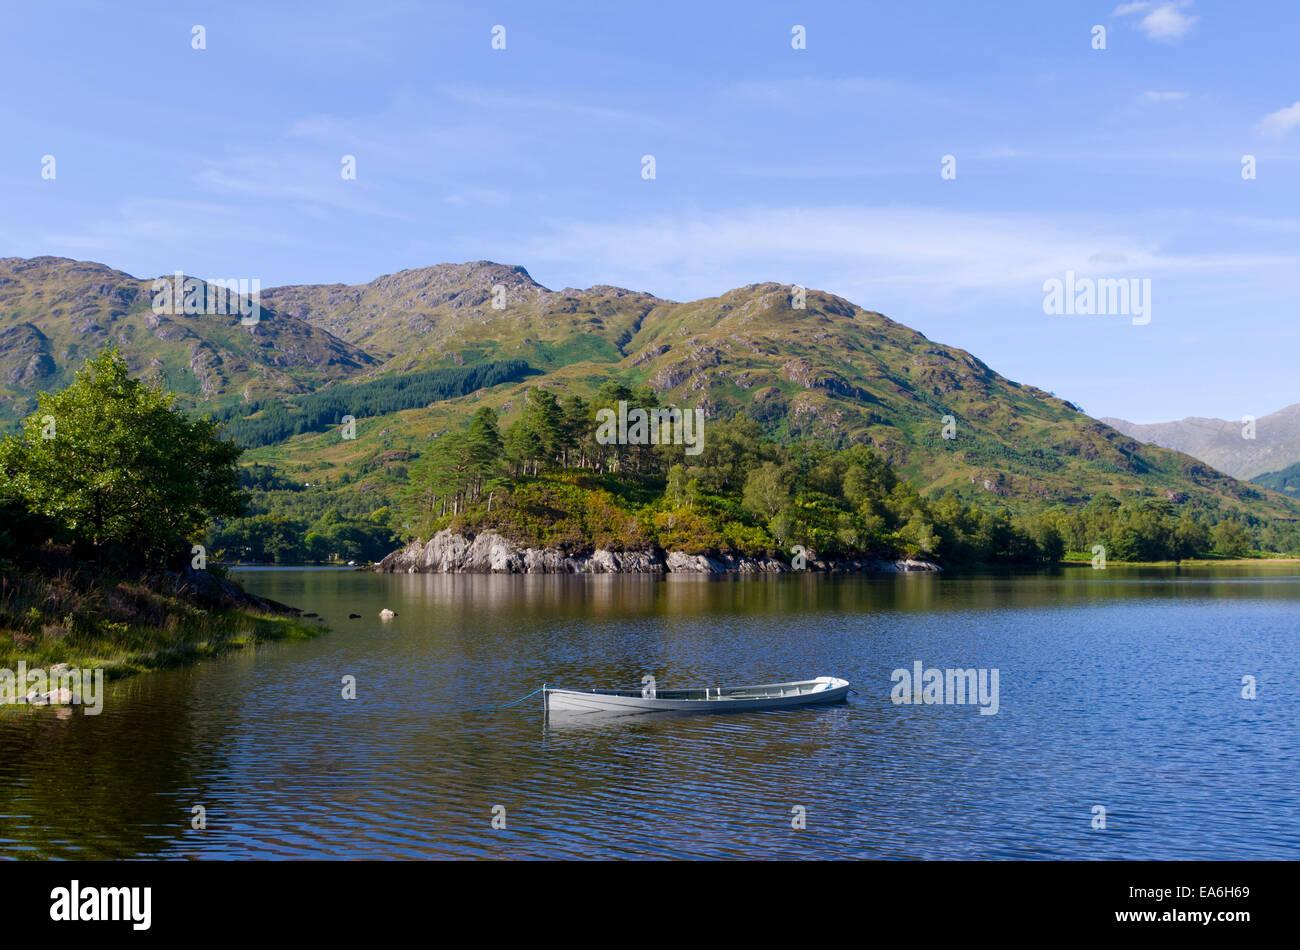 Loch Shiel, Glenfinnan, Lochaber, Inverness-shire, Highland, Scotland, UK - Stock Image